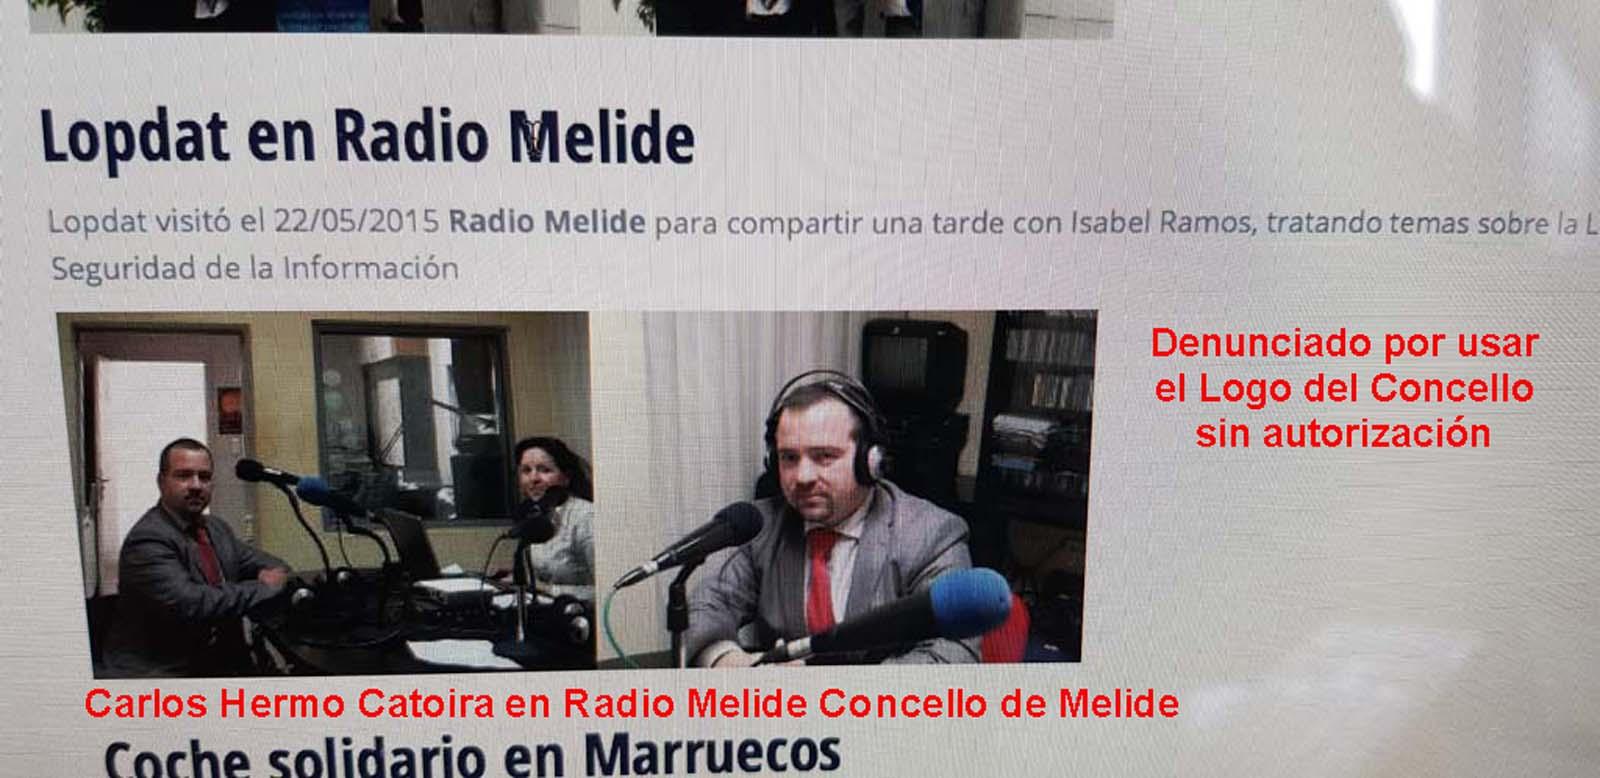 foto mediolocal estudioRadioMelideCarlosHermoCatoiracomoDircetordeLOPDAT